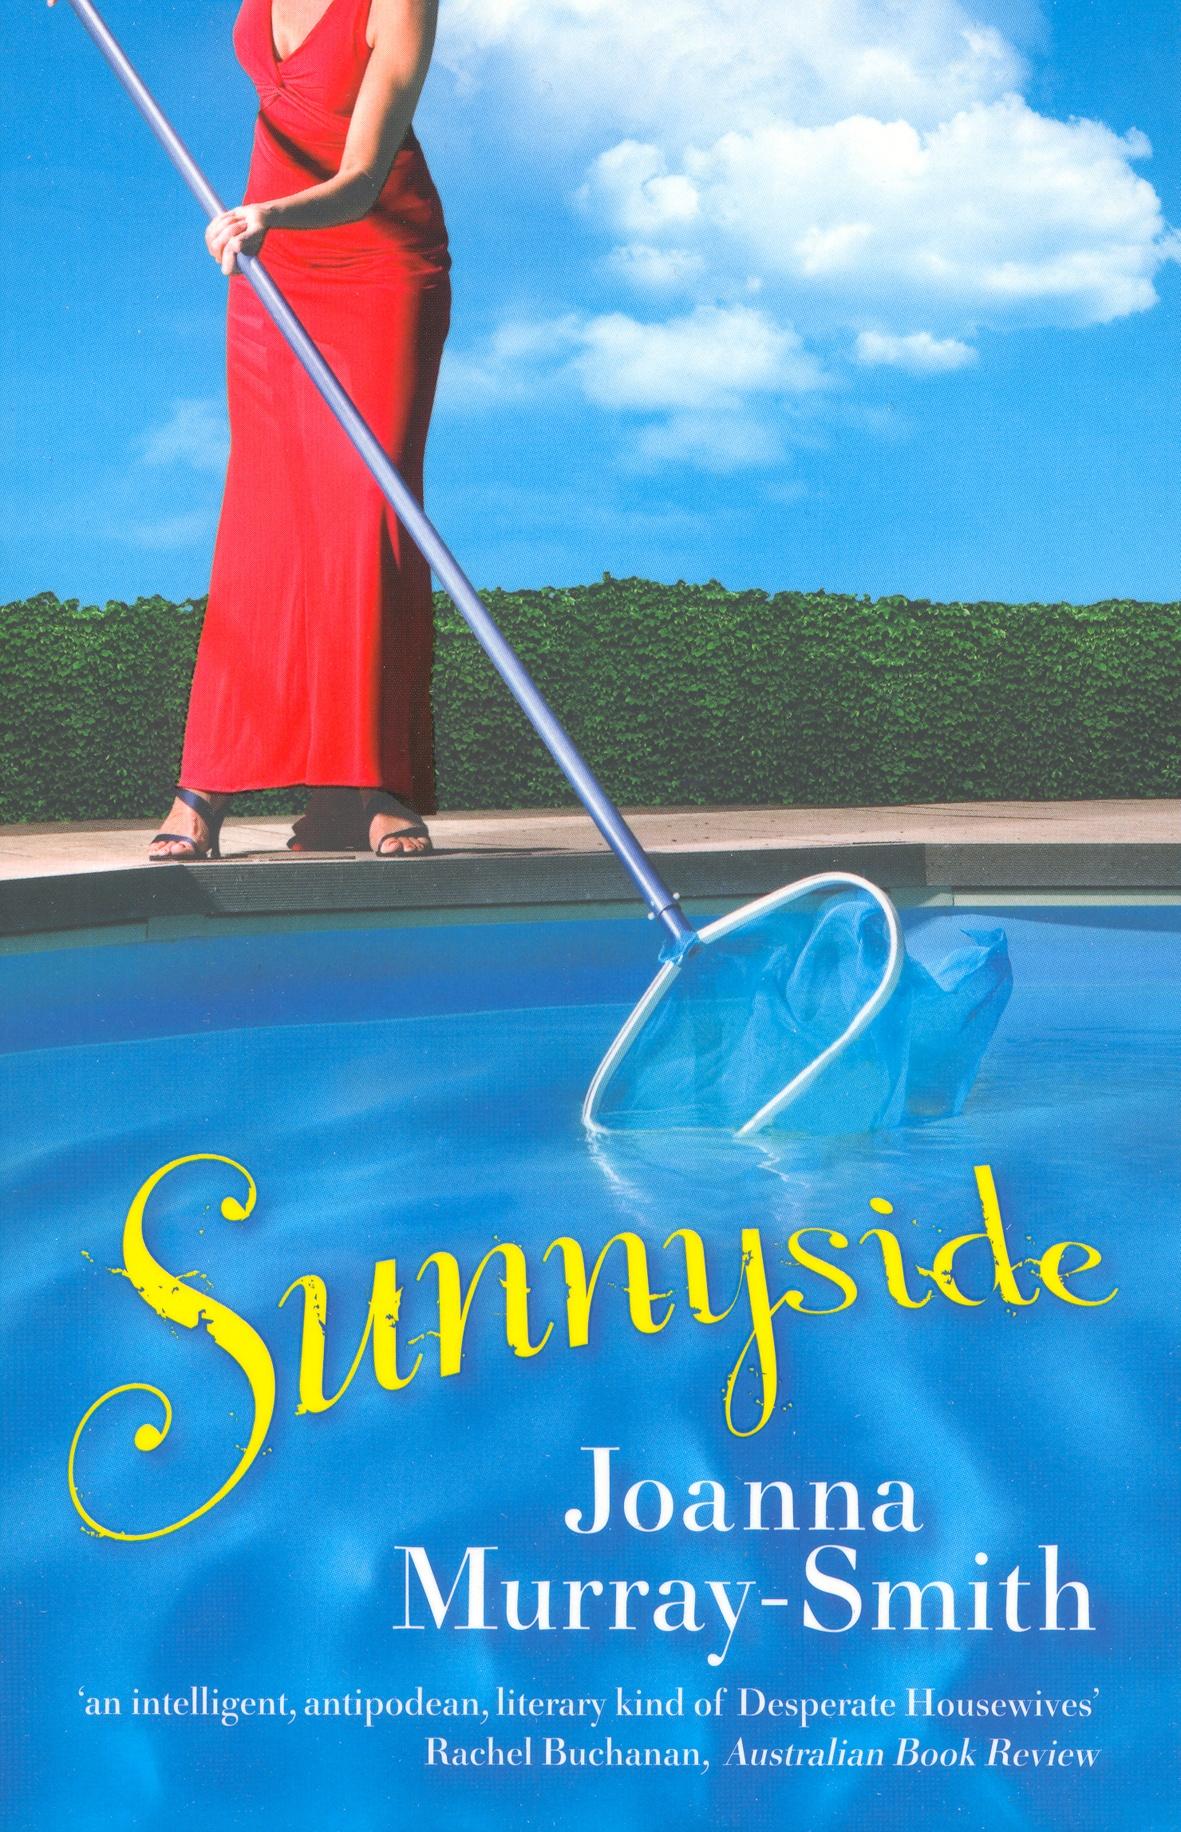 Sunnyside-9780143005360